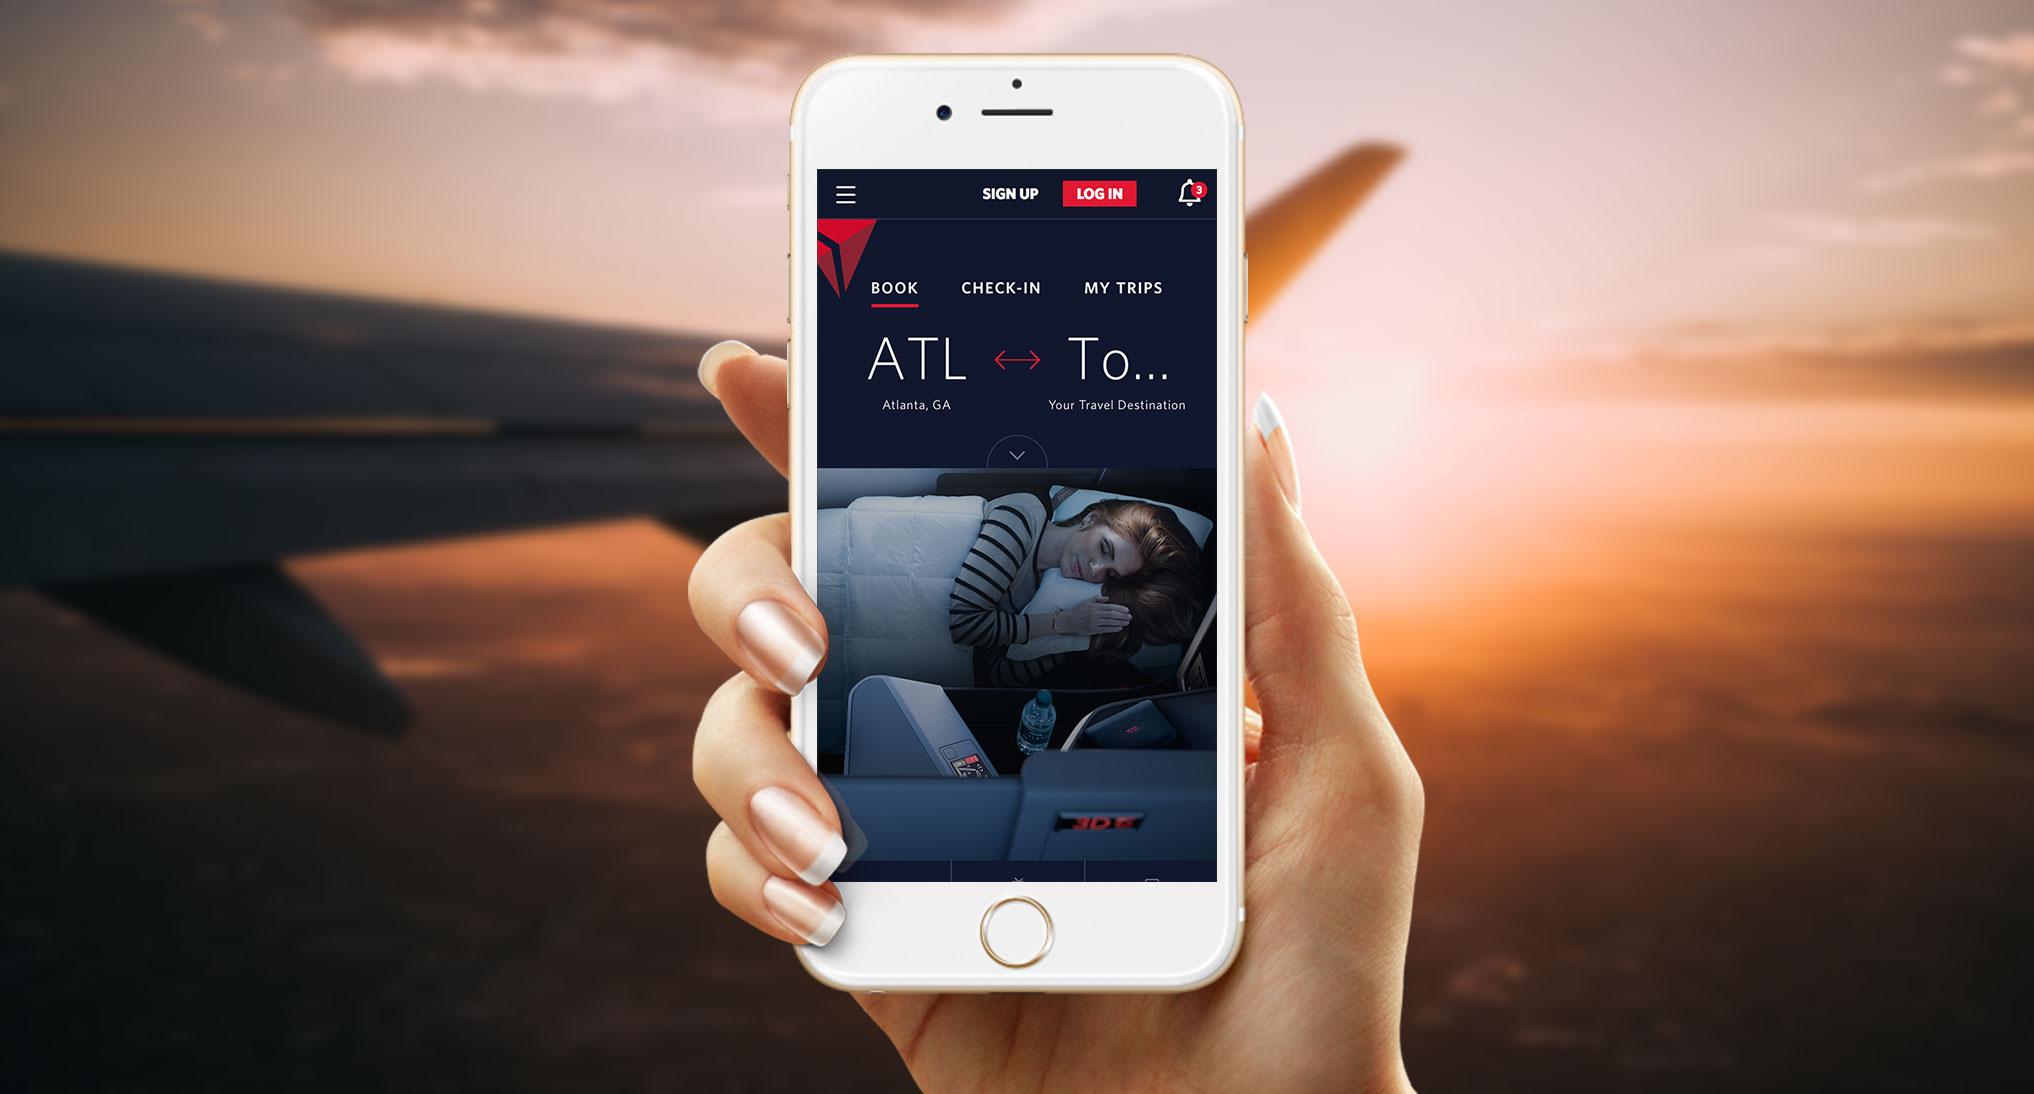 AKQA / Delta | Virgin Atlantic - Alicia Li